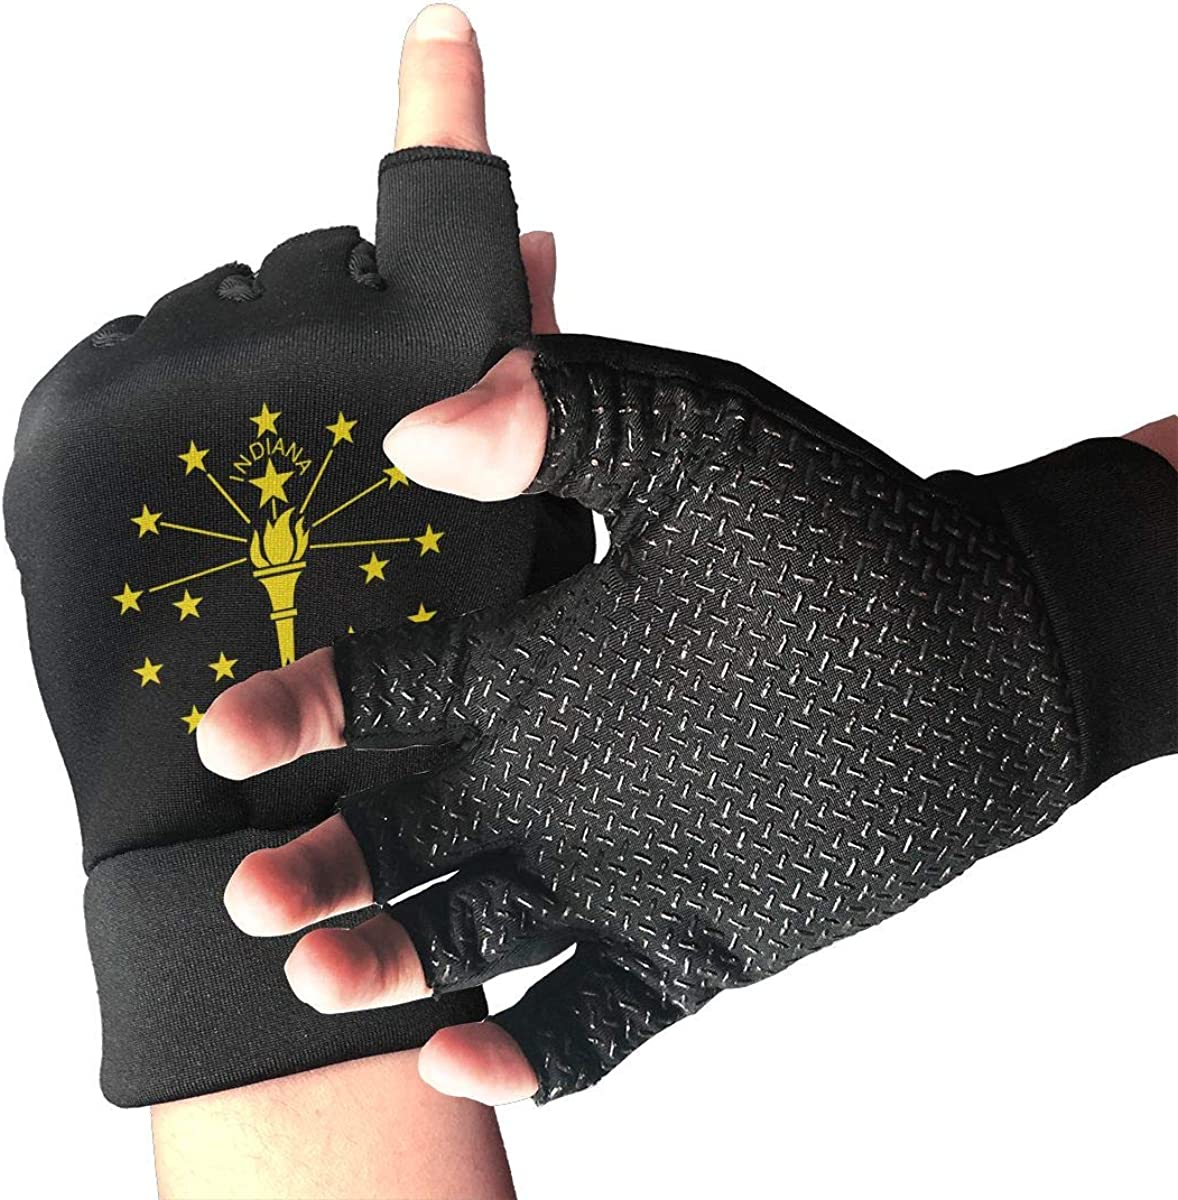 Gloves State Flag Indiana Fingerless Gloves Short Touchscreen Gloves Winter Motorcycle Biker Mitten